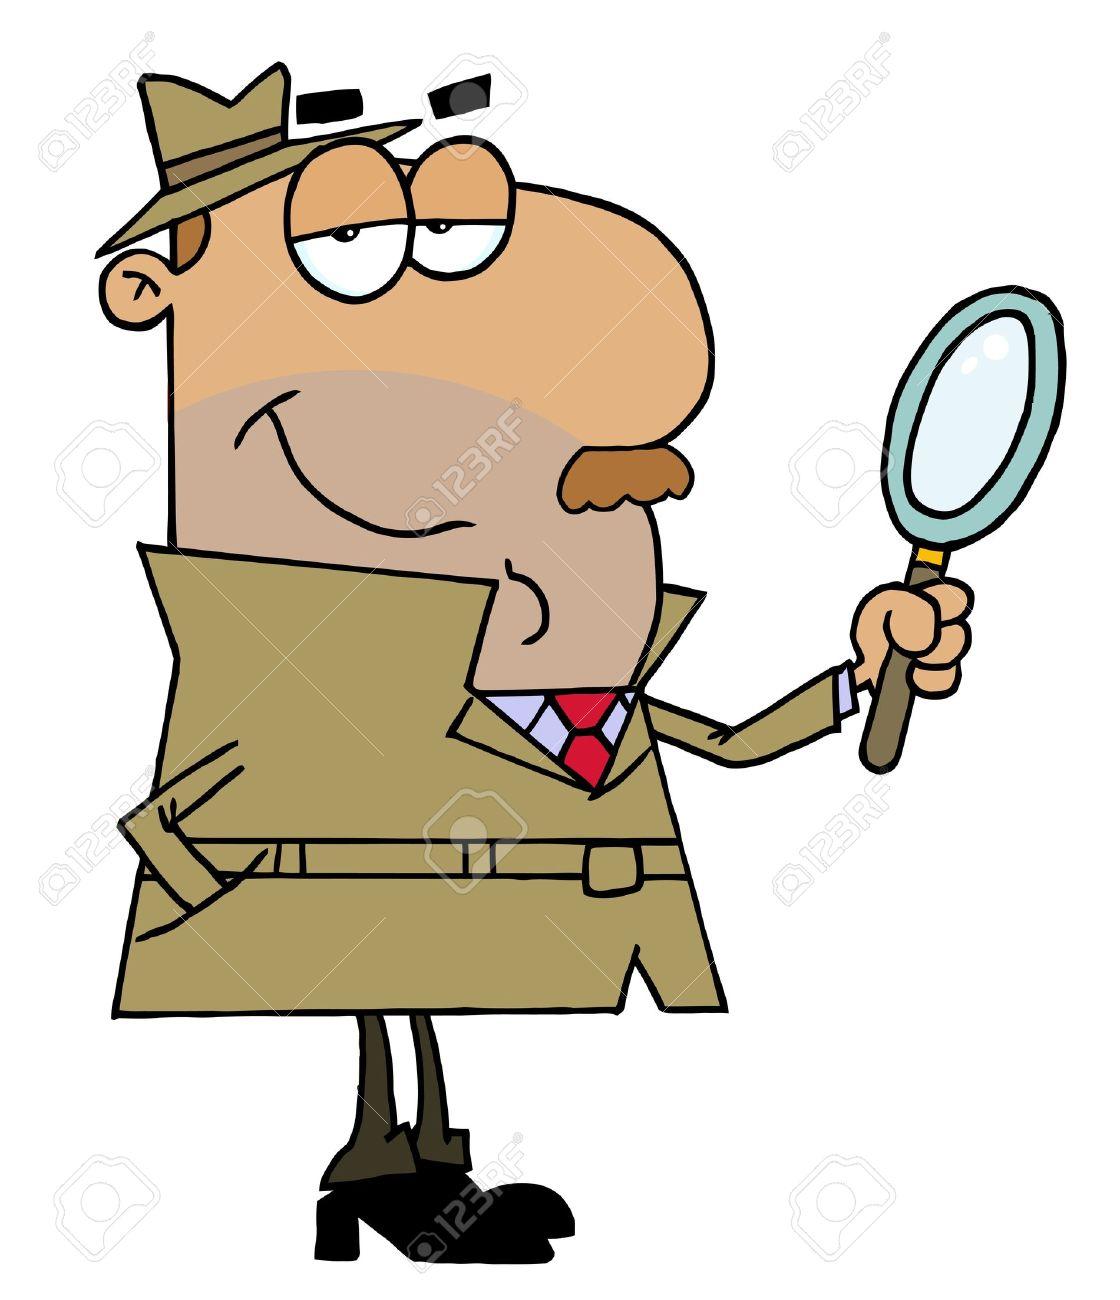 Hispanic Cartoon Detective Man Stock Vector - 6905716